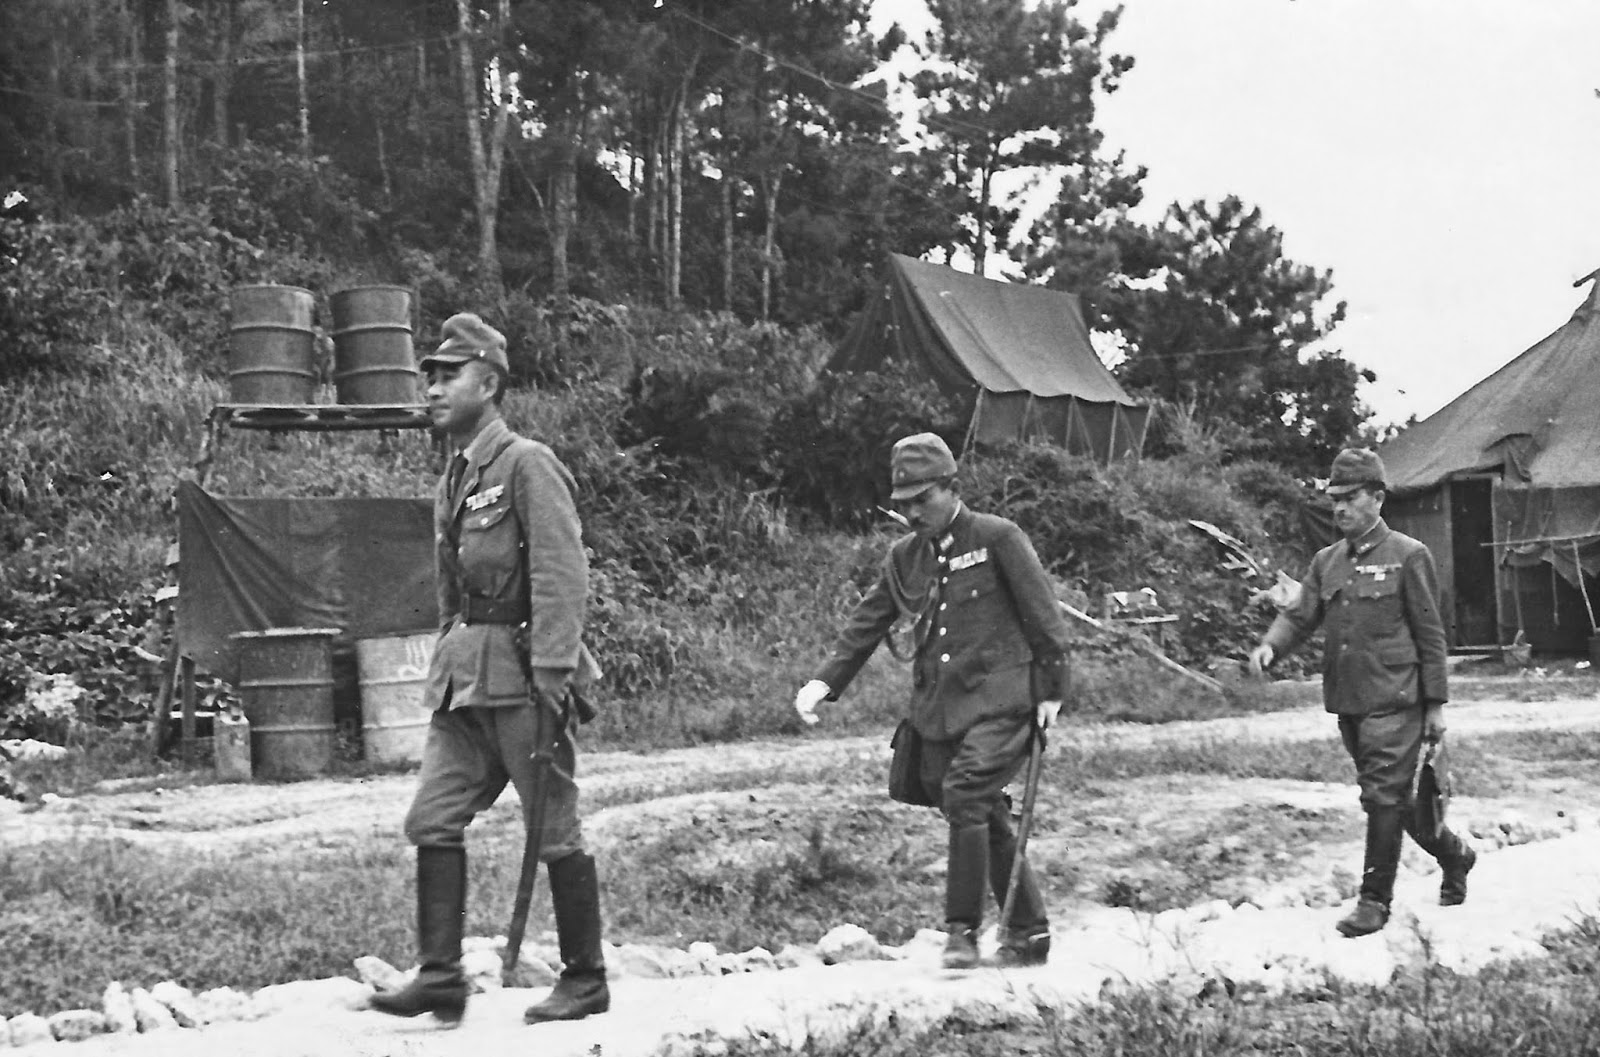 Urthman's Genealogy Blog: Surrender Day On Okinawa